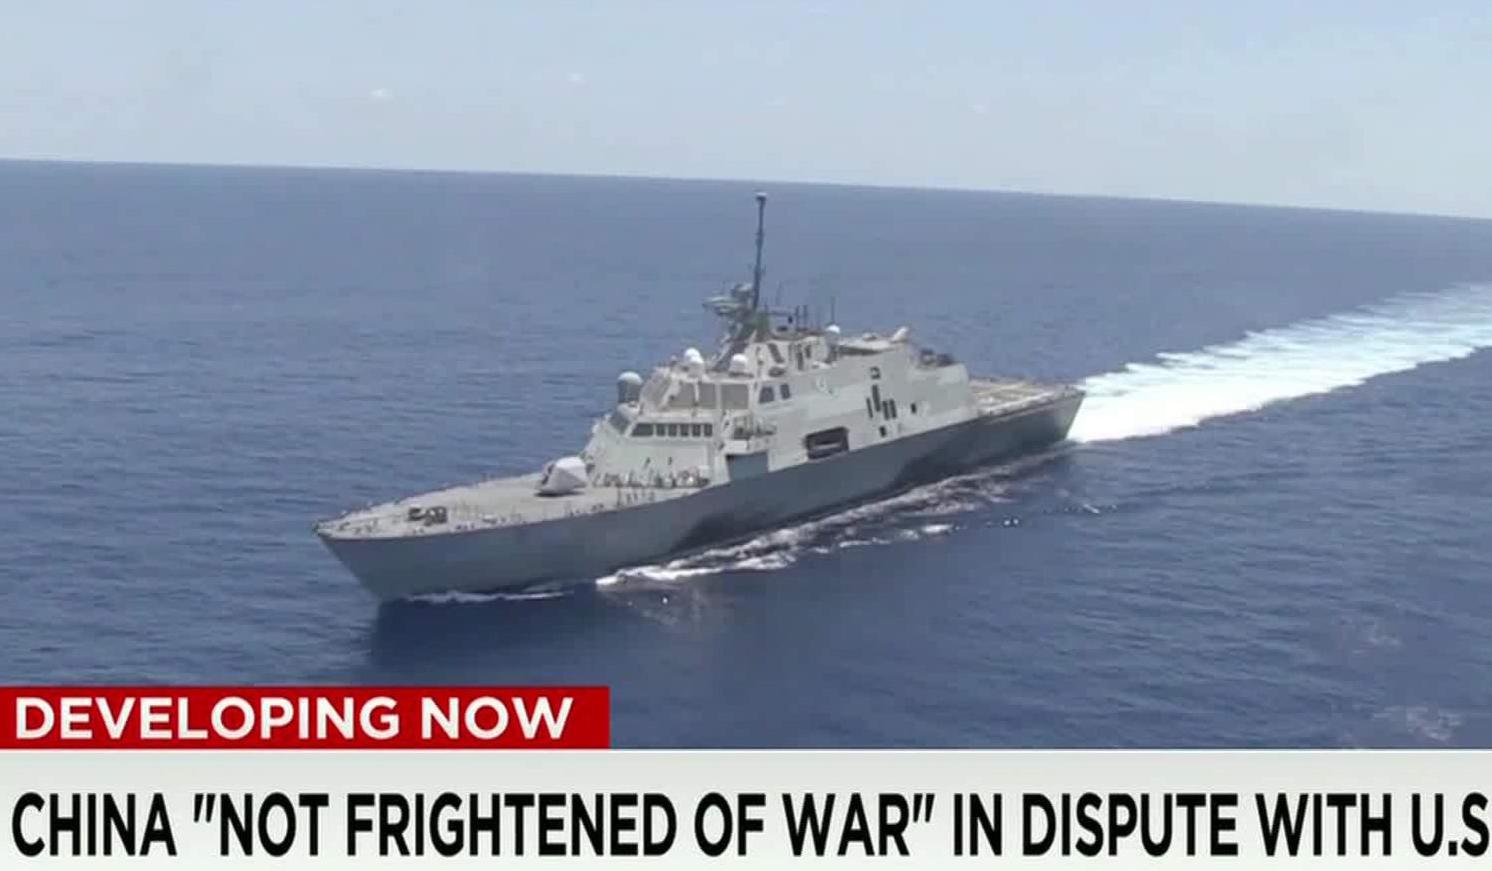 China warns the US over warship in China's sea